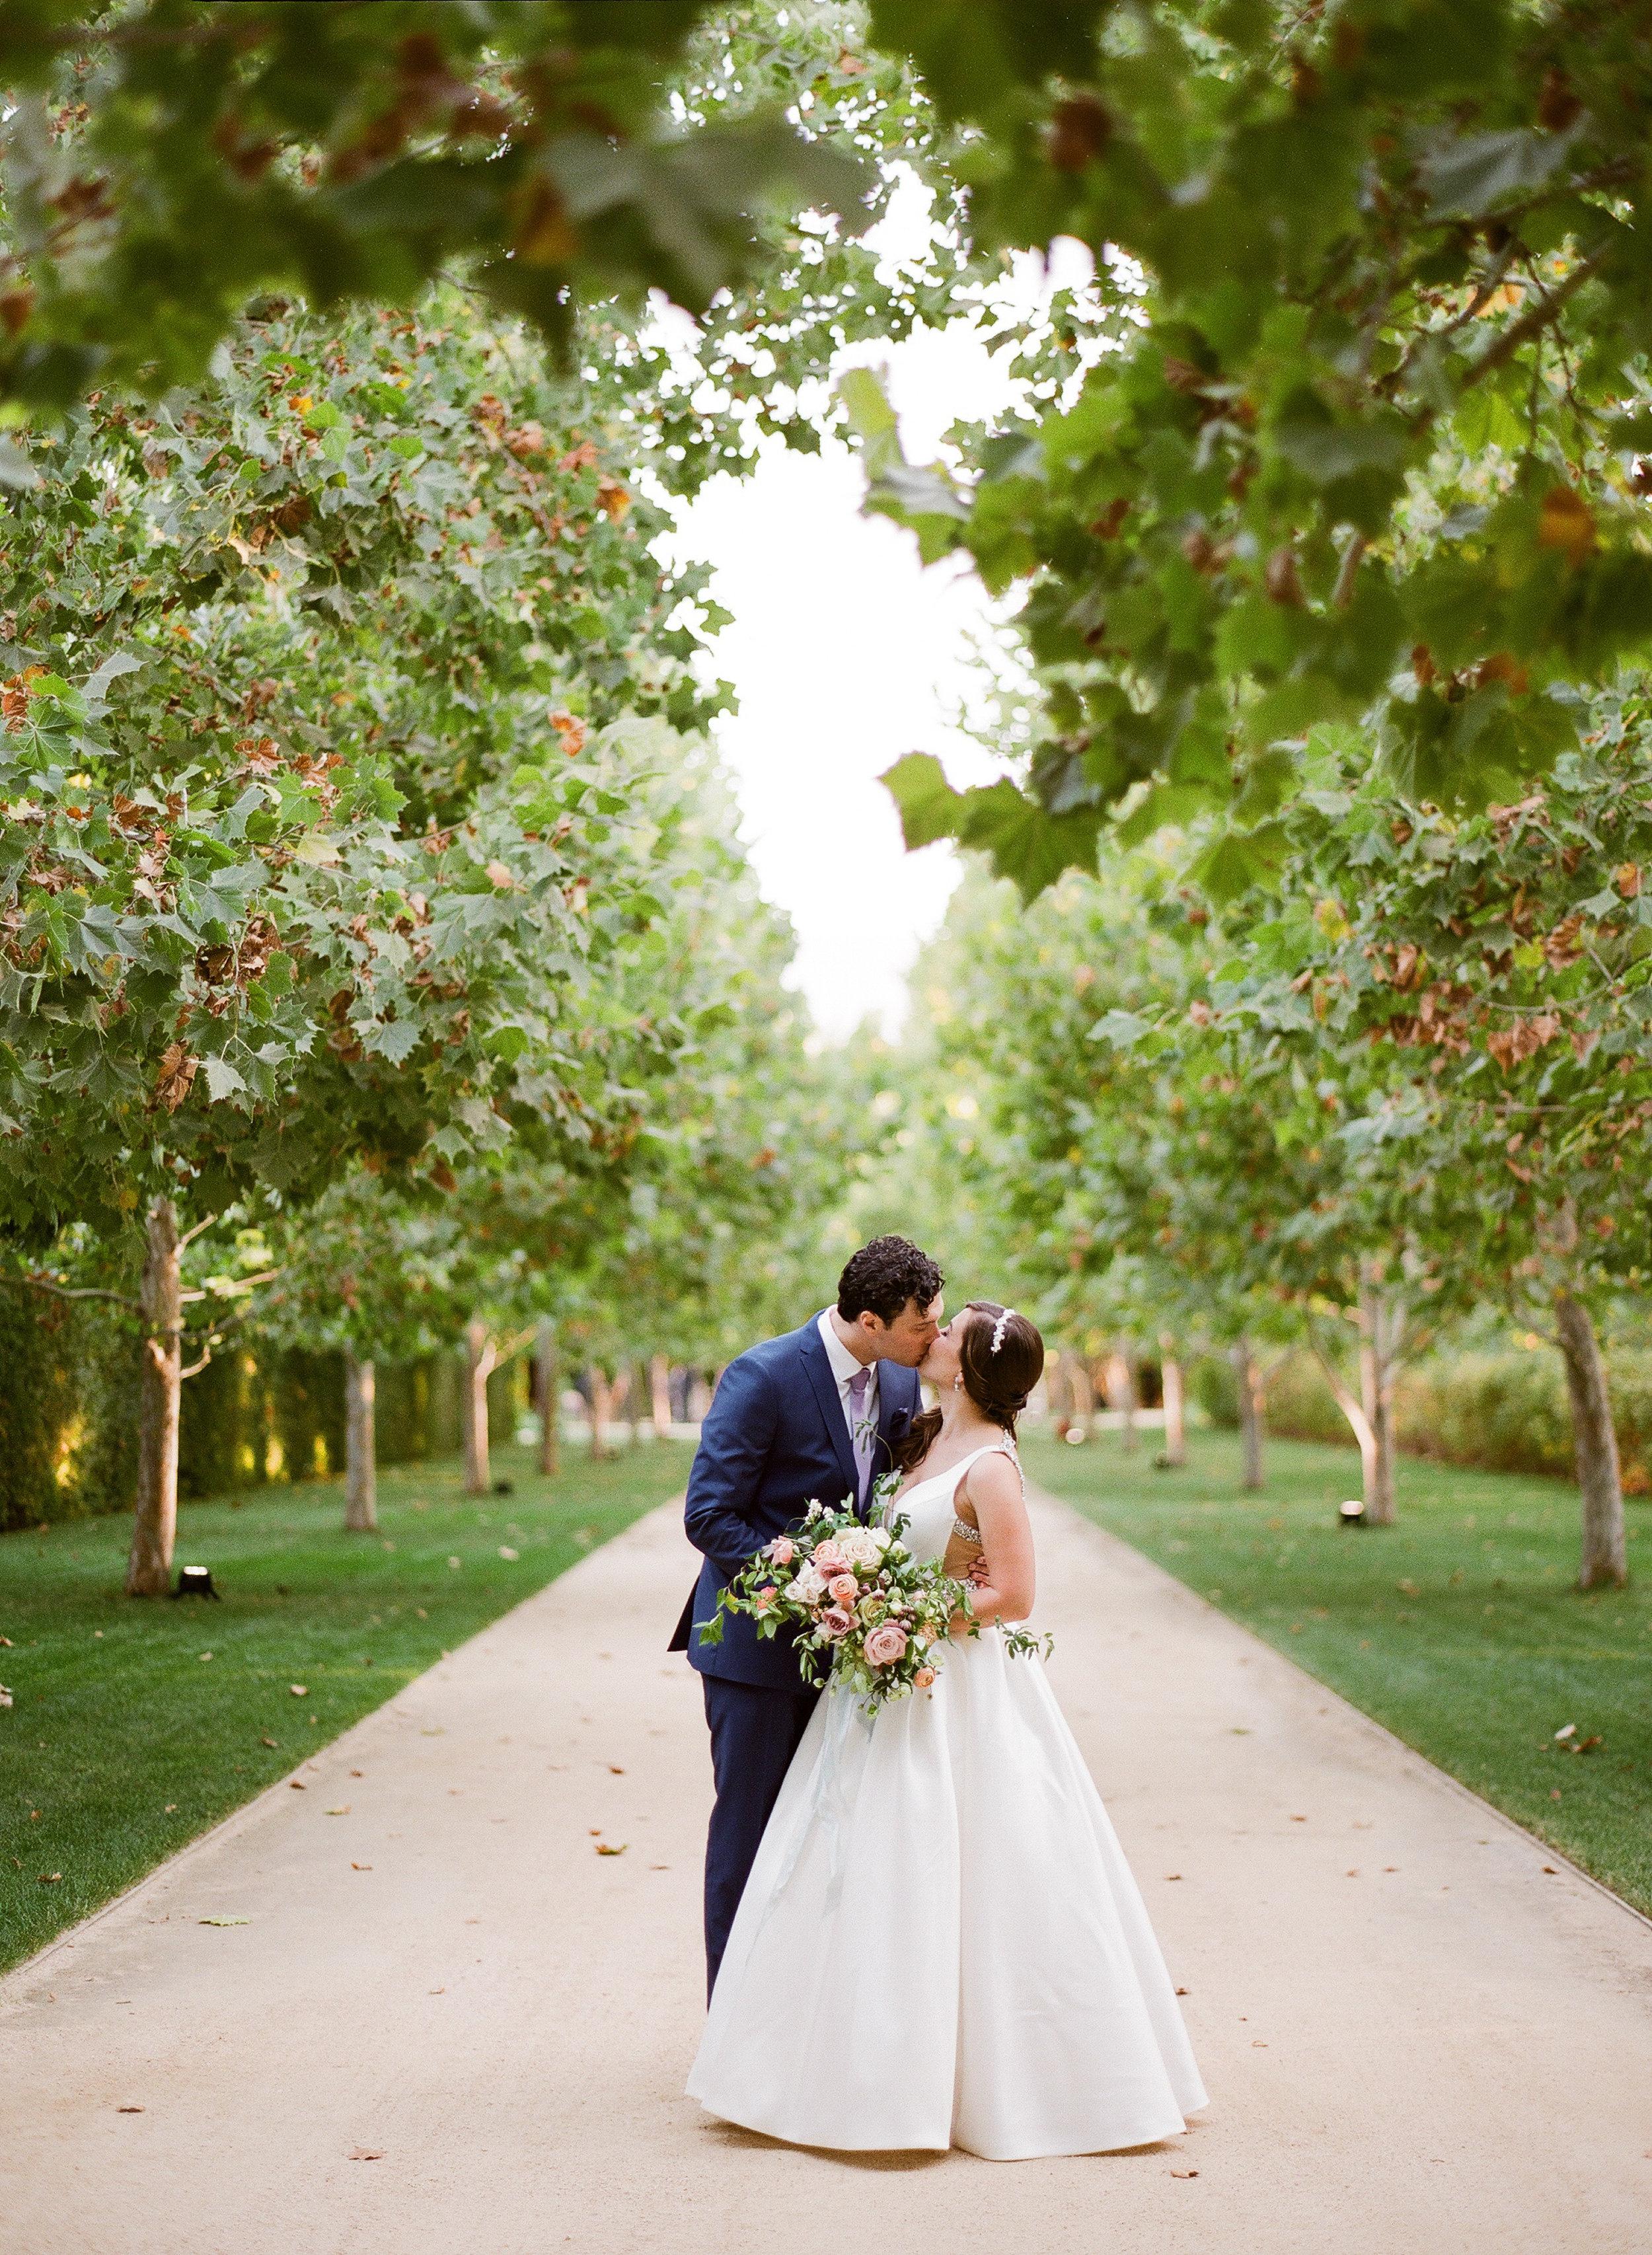 santa-barbara-elopement-elope-wedding-planner-planning-coordinator-day-of-intimate-event-design-kestrel-park-santa-ynez-english-country-estate-garden-castle (1).jpg